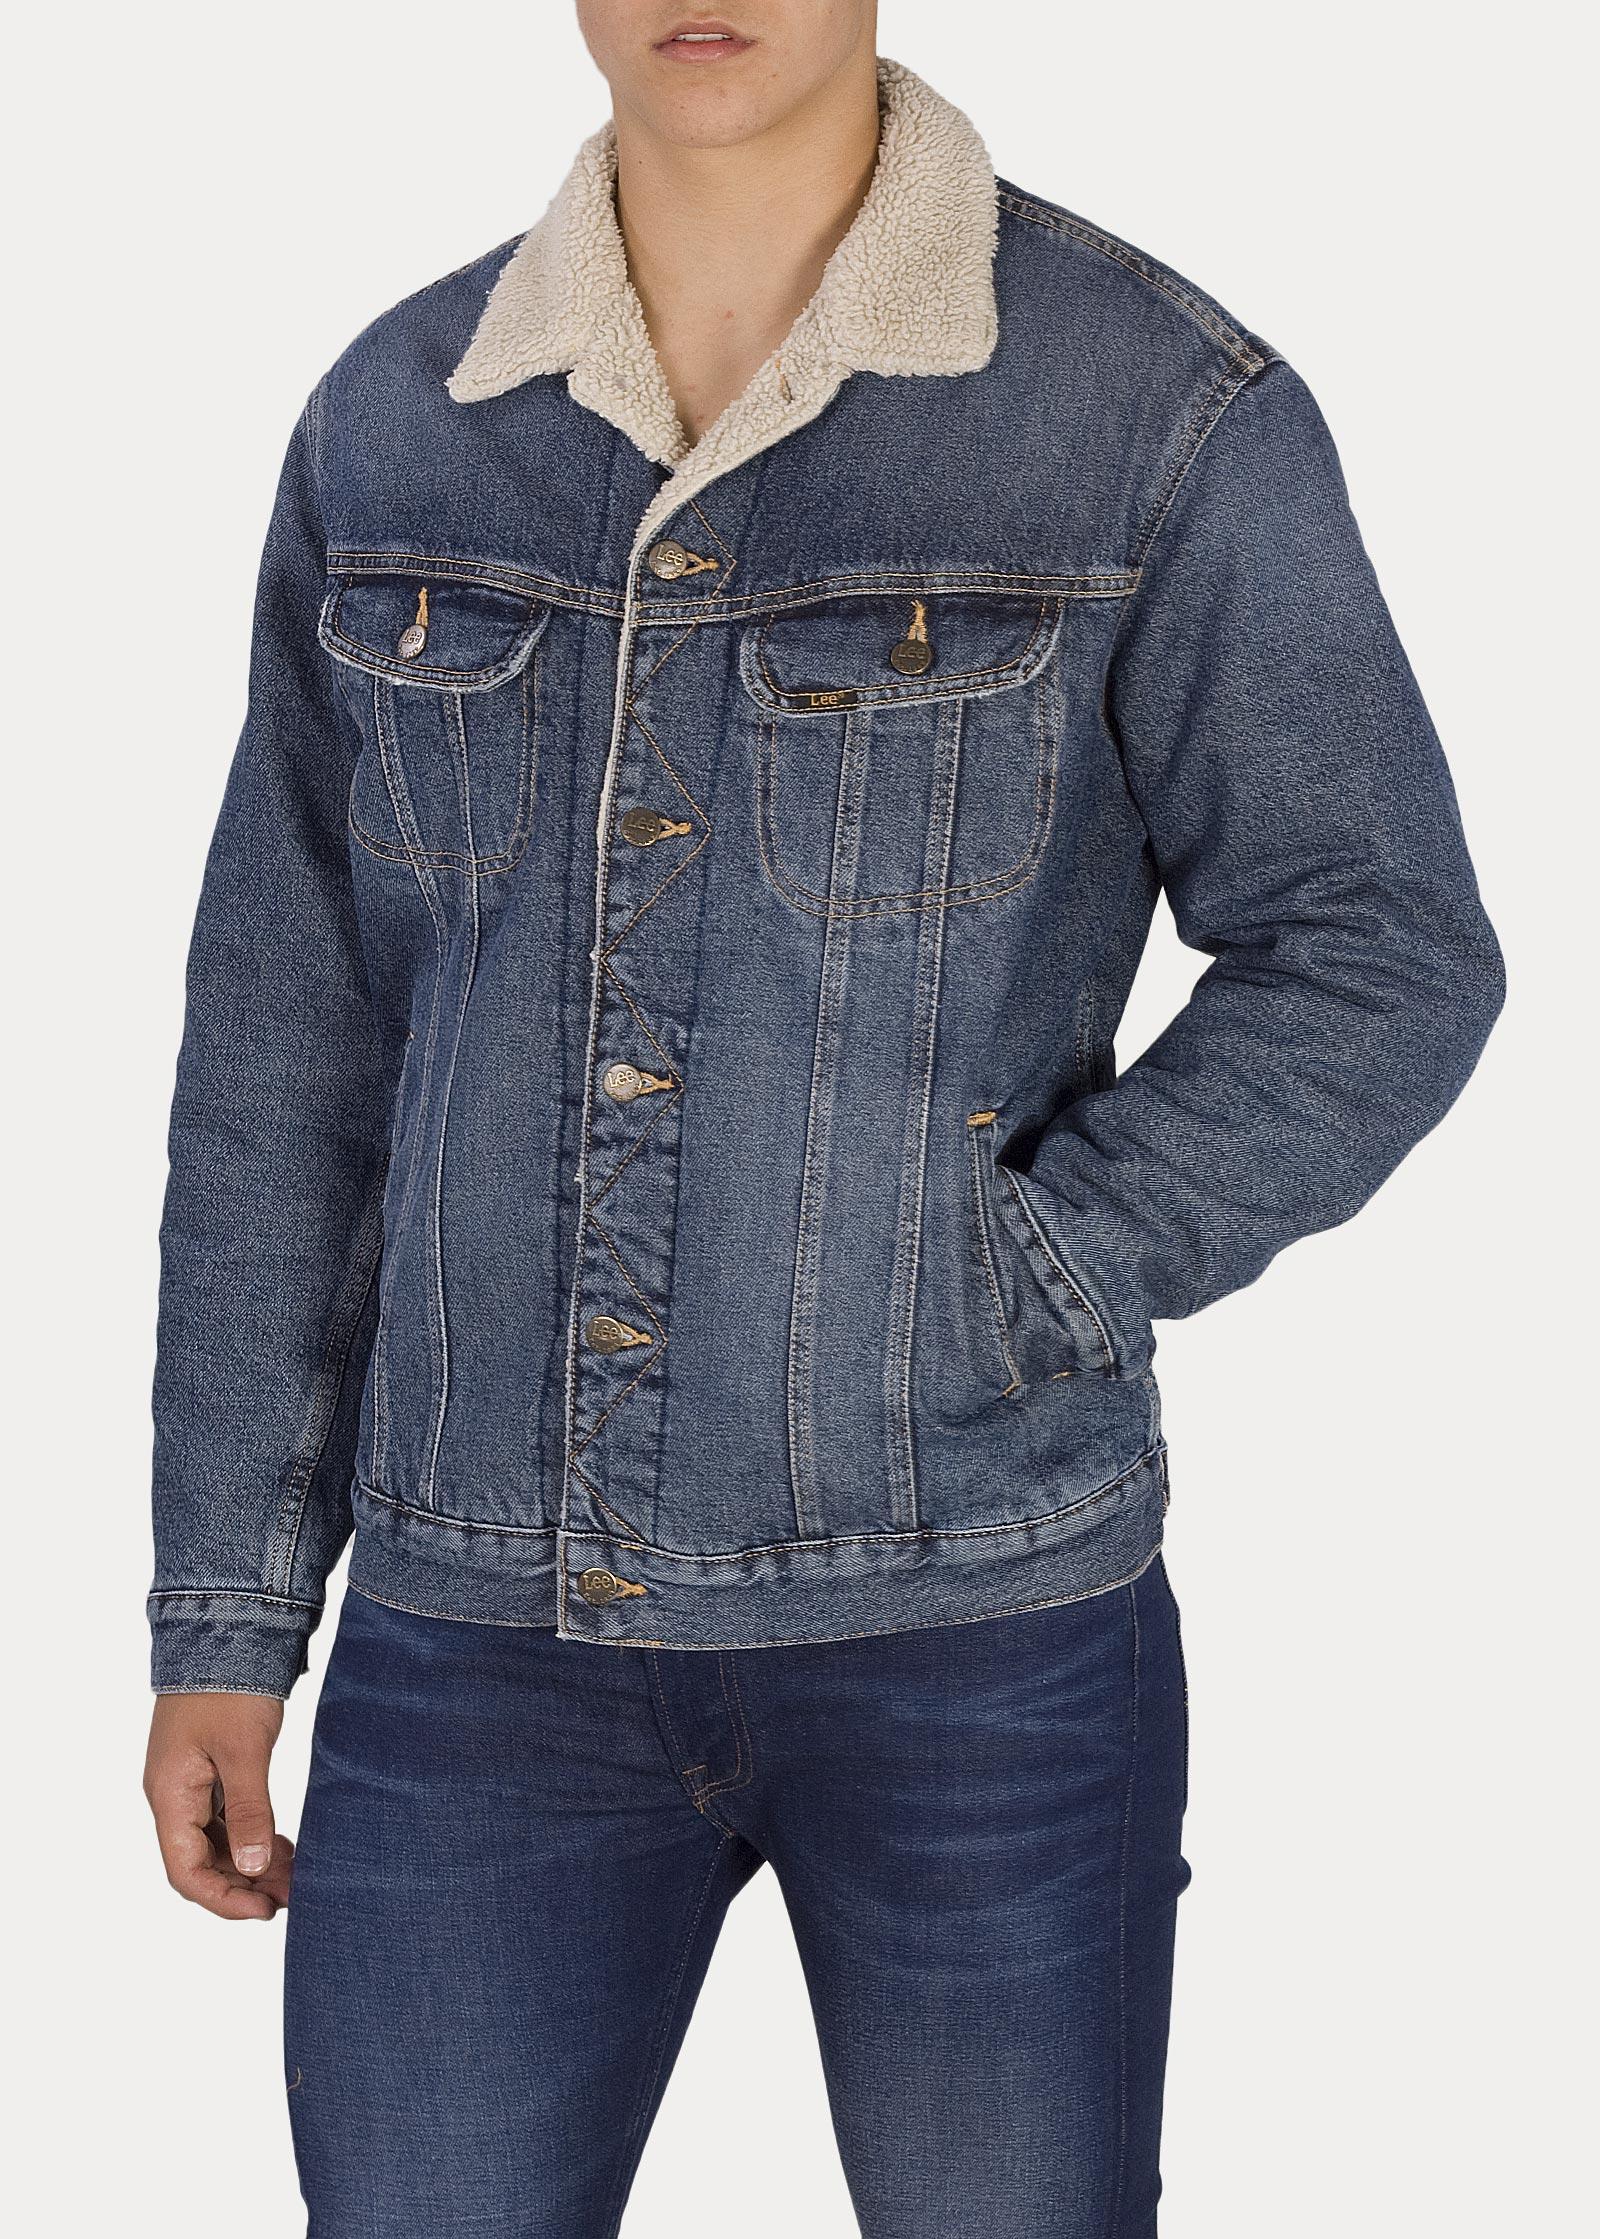 Lee Jacken Vintage Jacket Herren Sherpa Worn lcuKFJ13T5